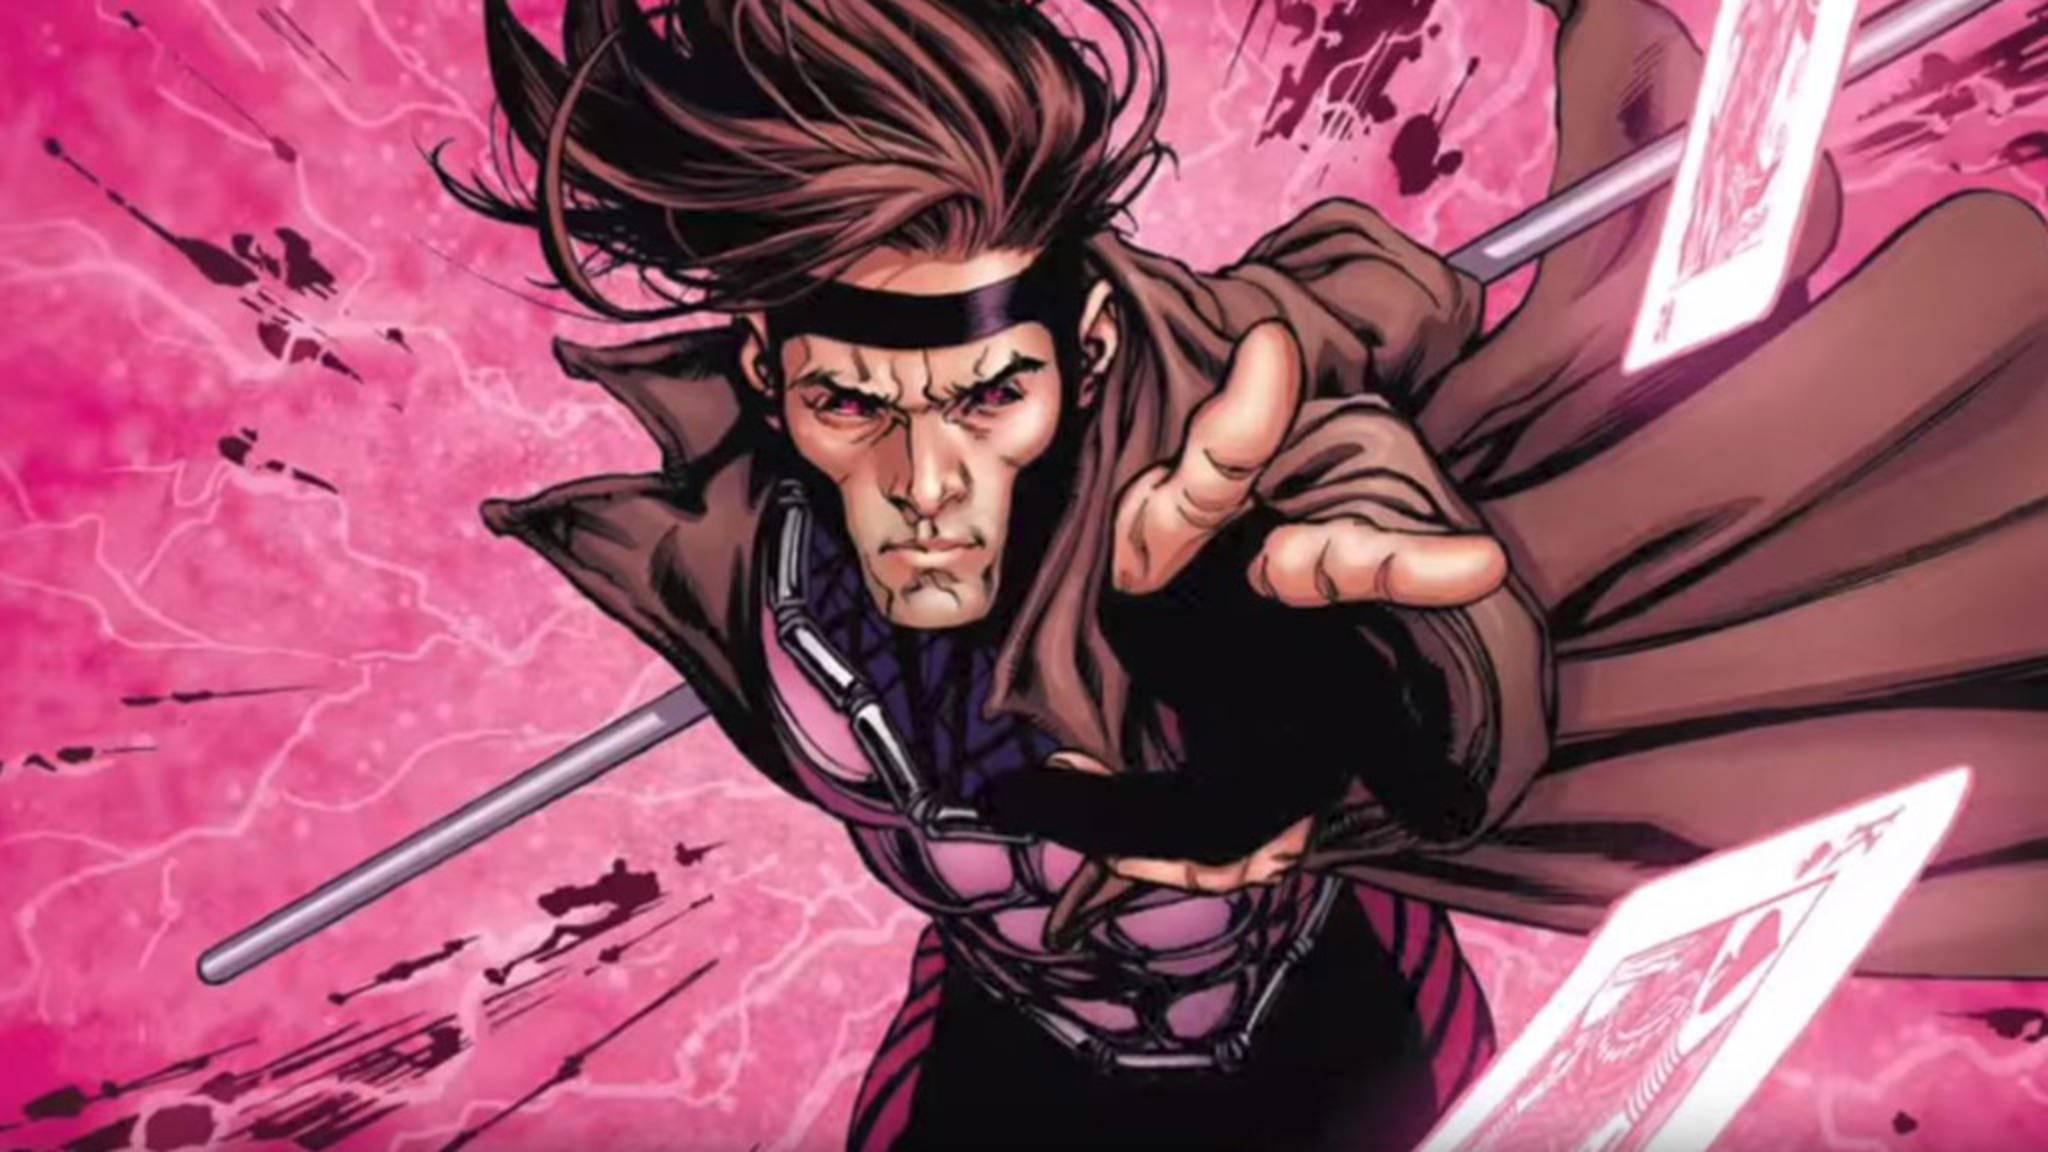 Gambit hat gute Karten, Anfang 2019 in die Kinos zu kommen.